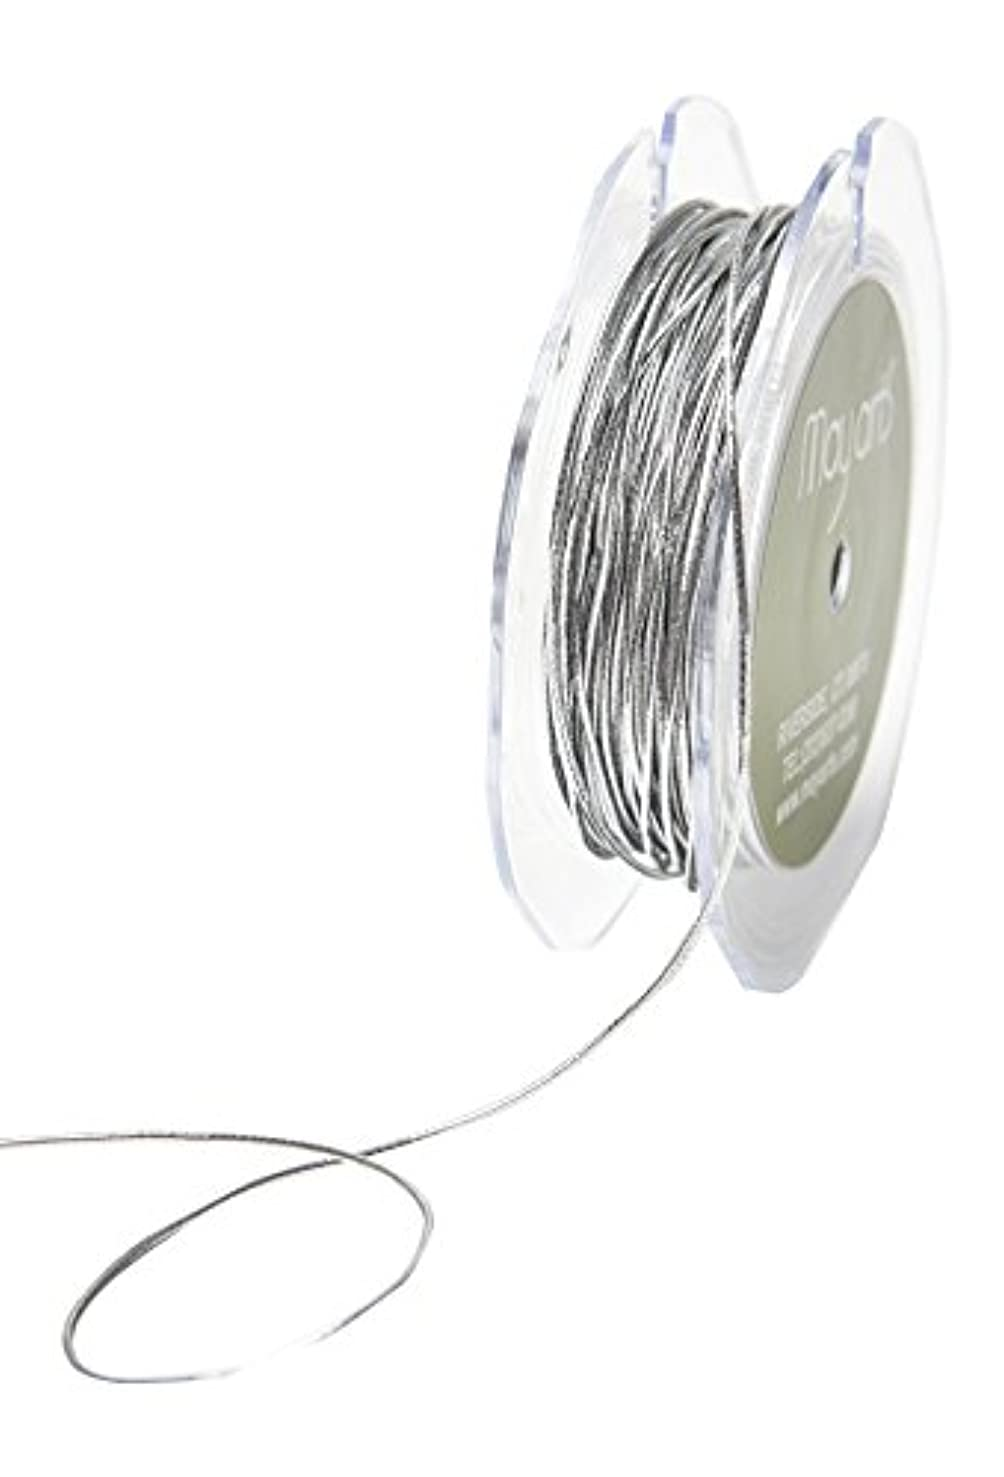 May Arts Ribbon 1 mm Elastic String Ribbon 50 yd Metallic Silver